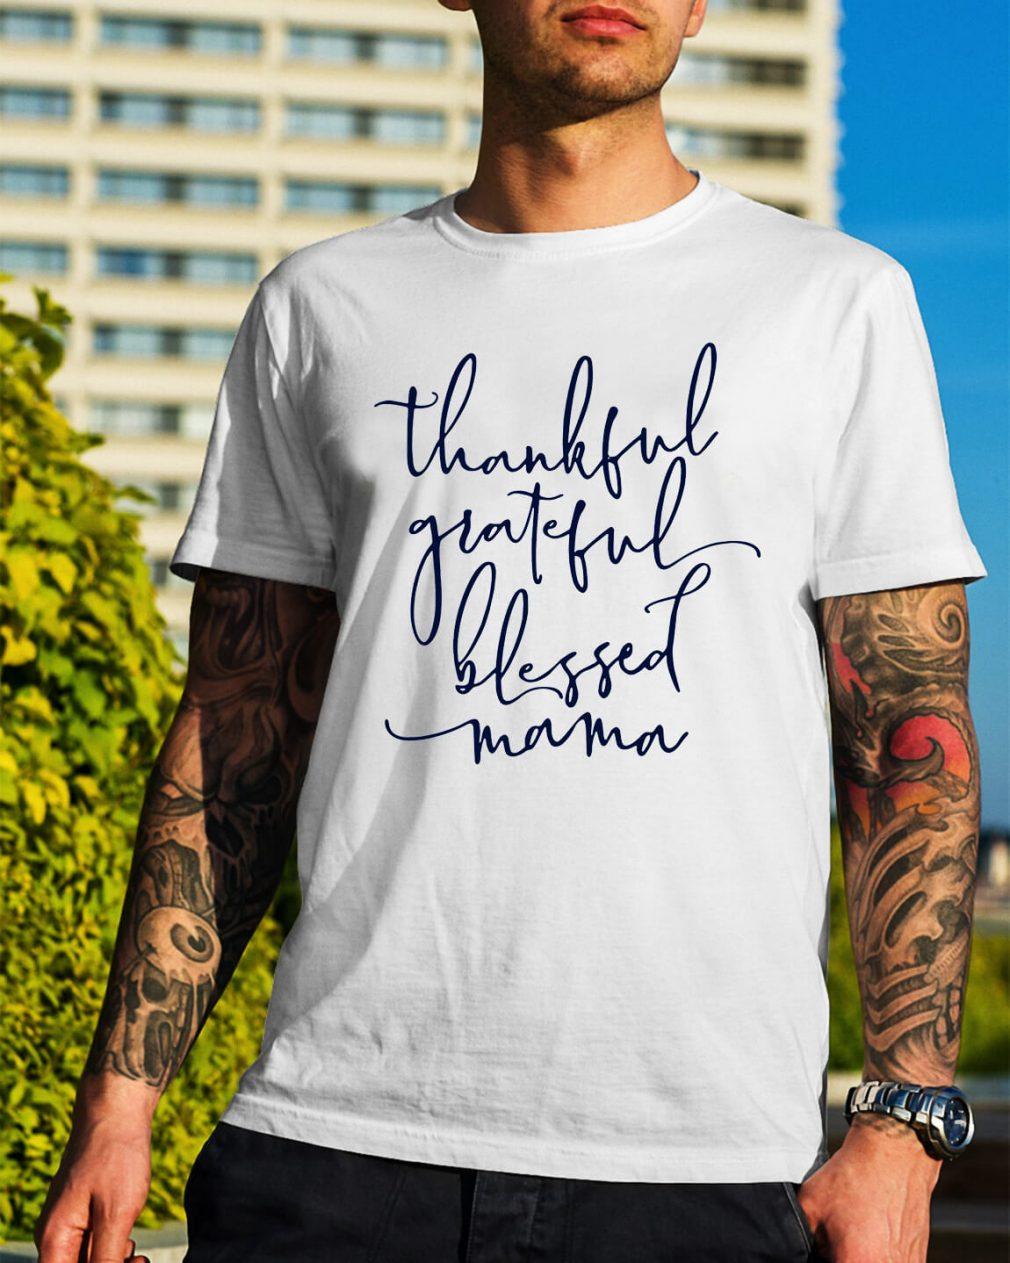 Thankful grateful blessed Mama shirt